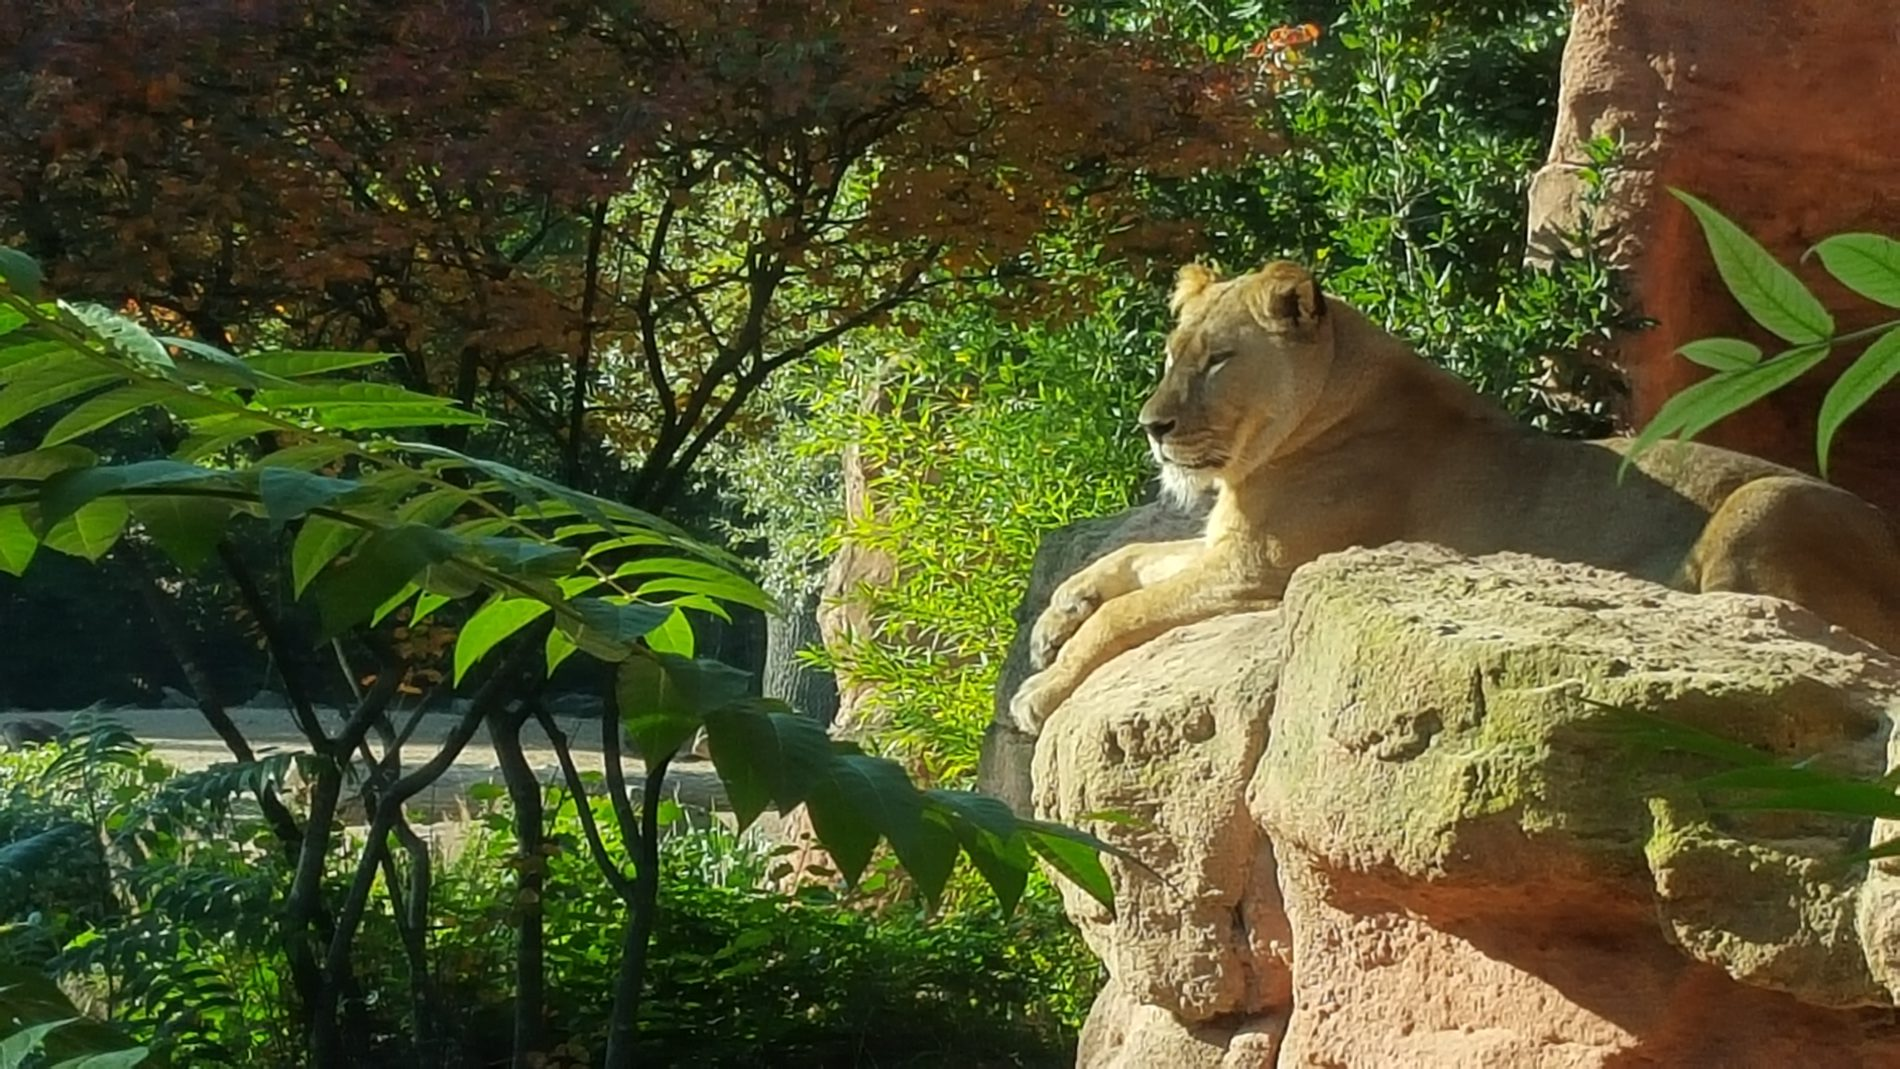 Erlebniszoo Hannover, das Löwengehege